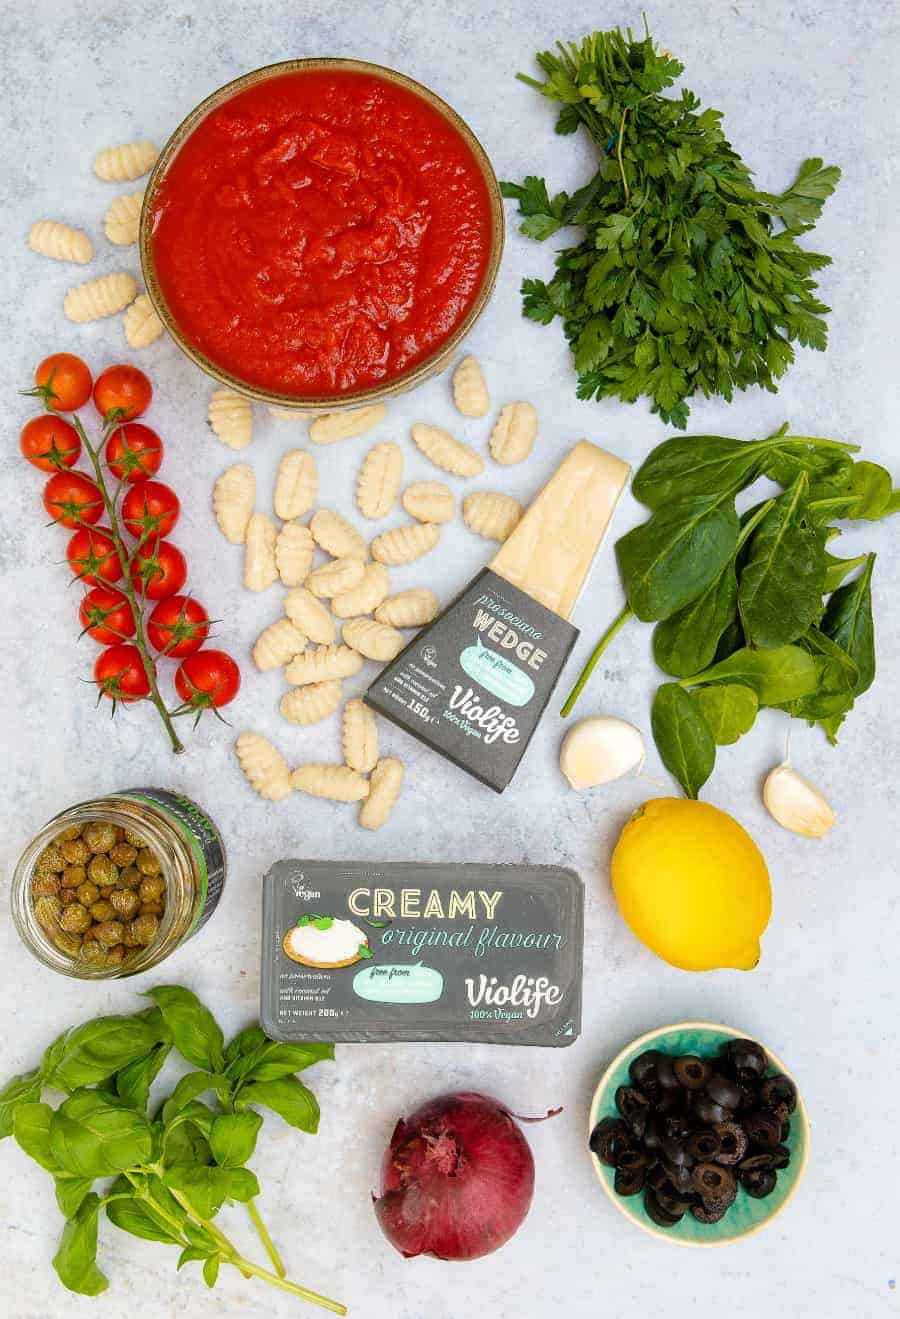 Cheesy Vegan Gnocchi Bake - Ingredients